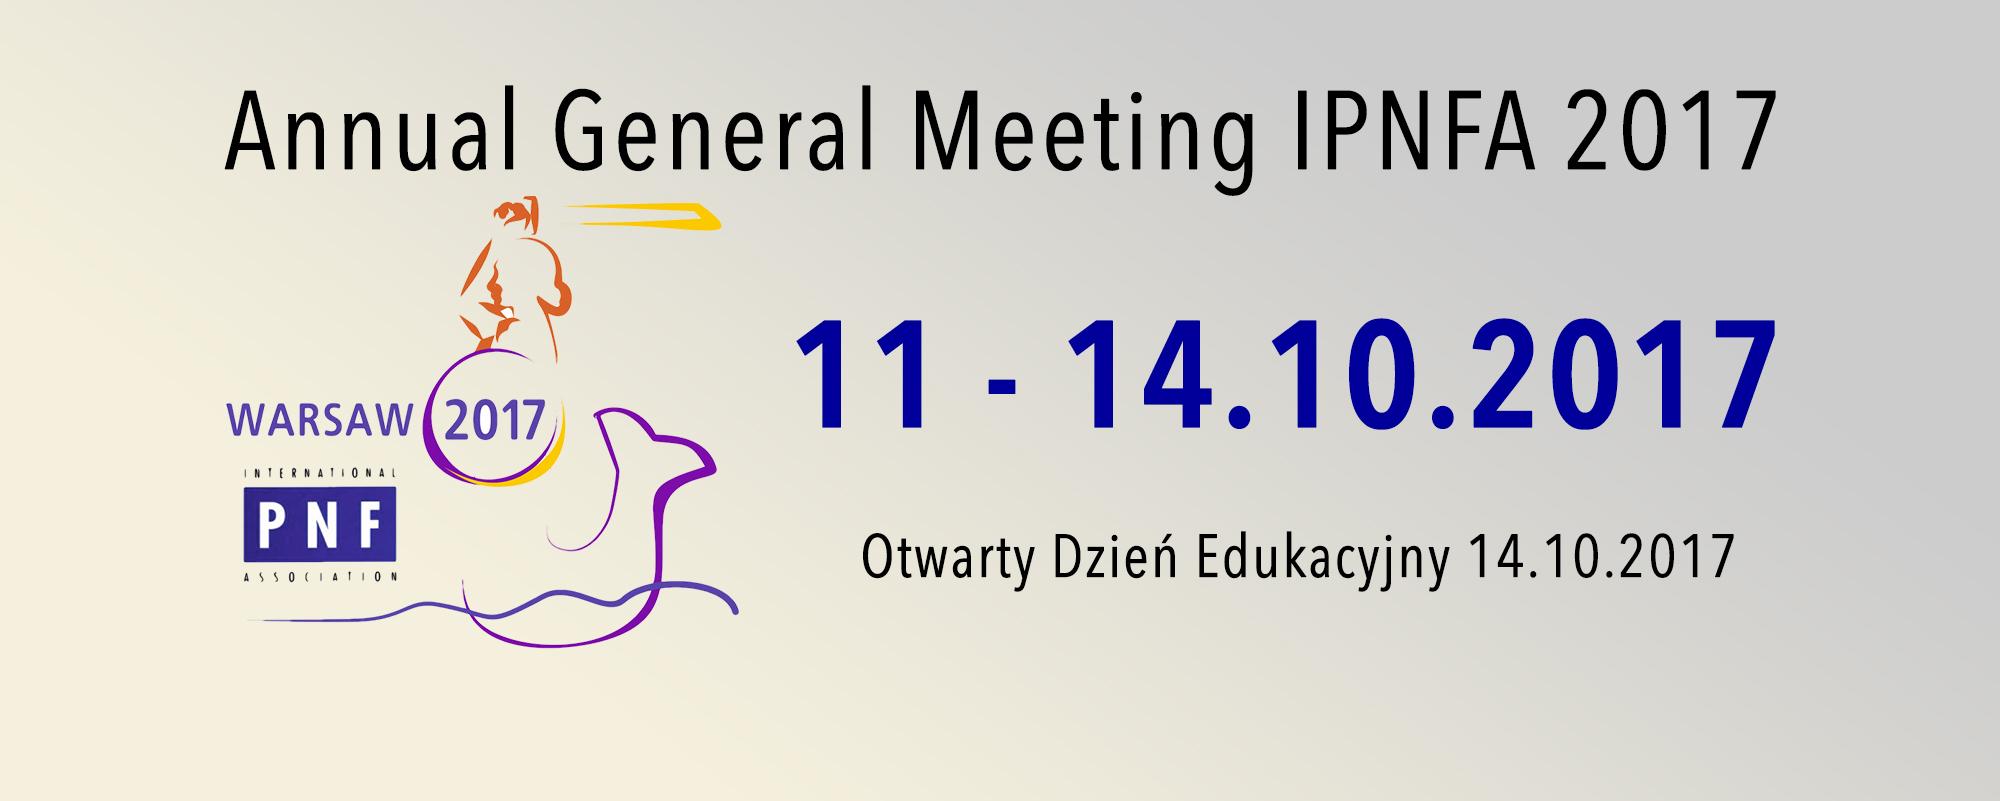 IPNFA Poland